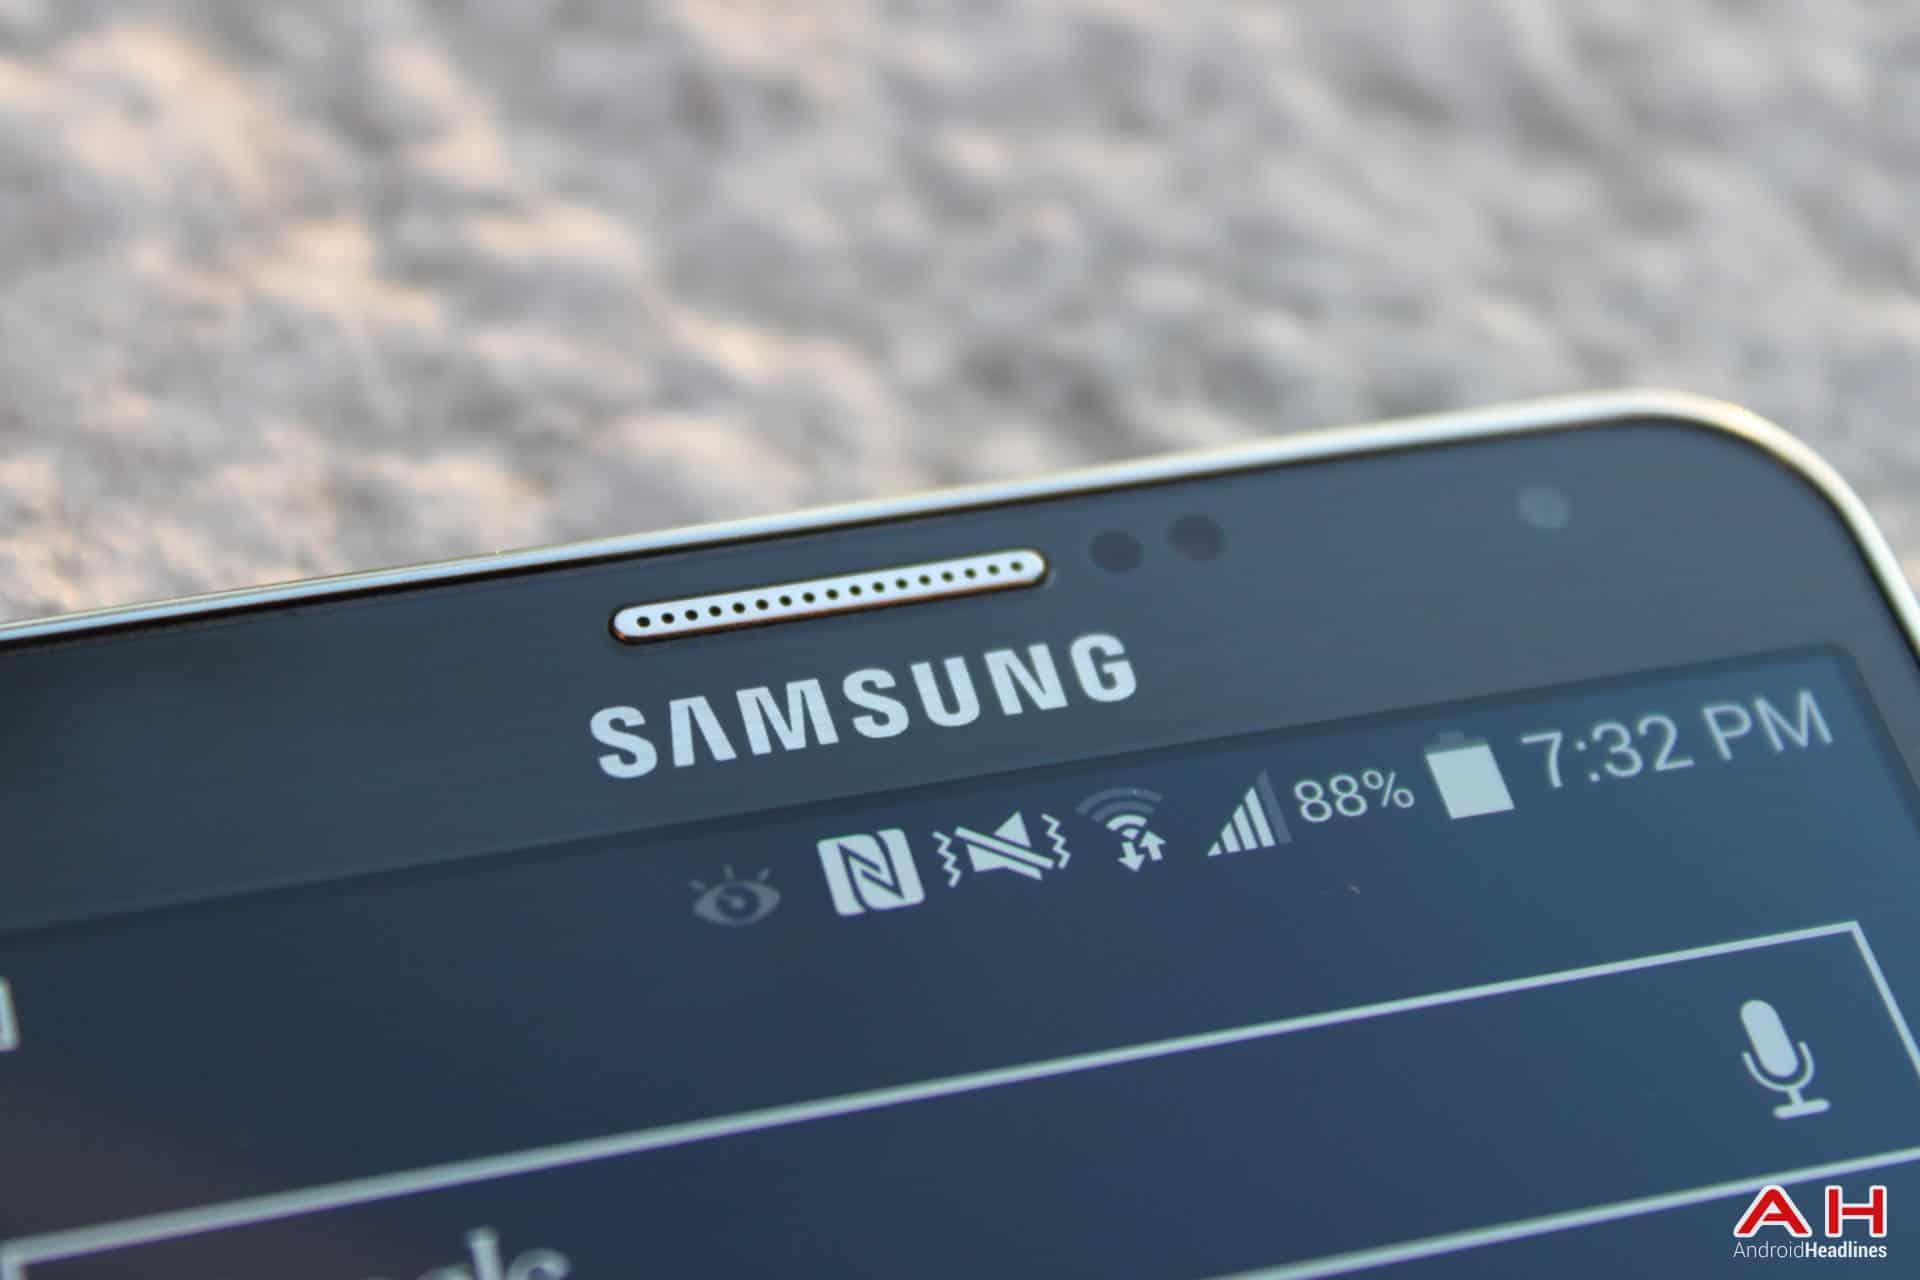 AH Samsung Logo Note 3 3.0